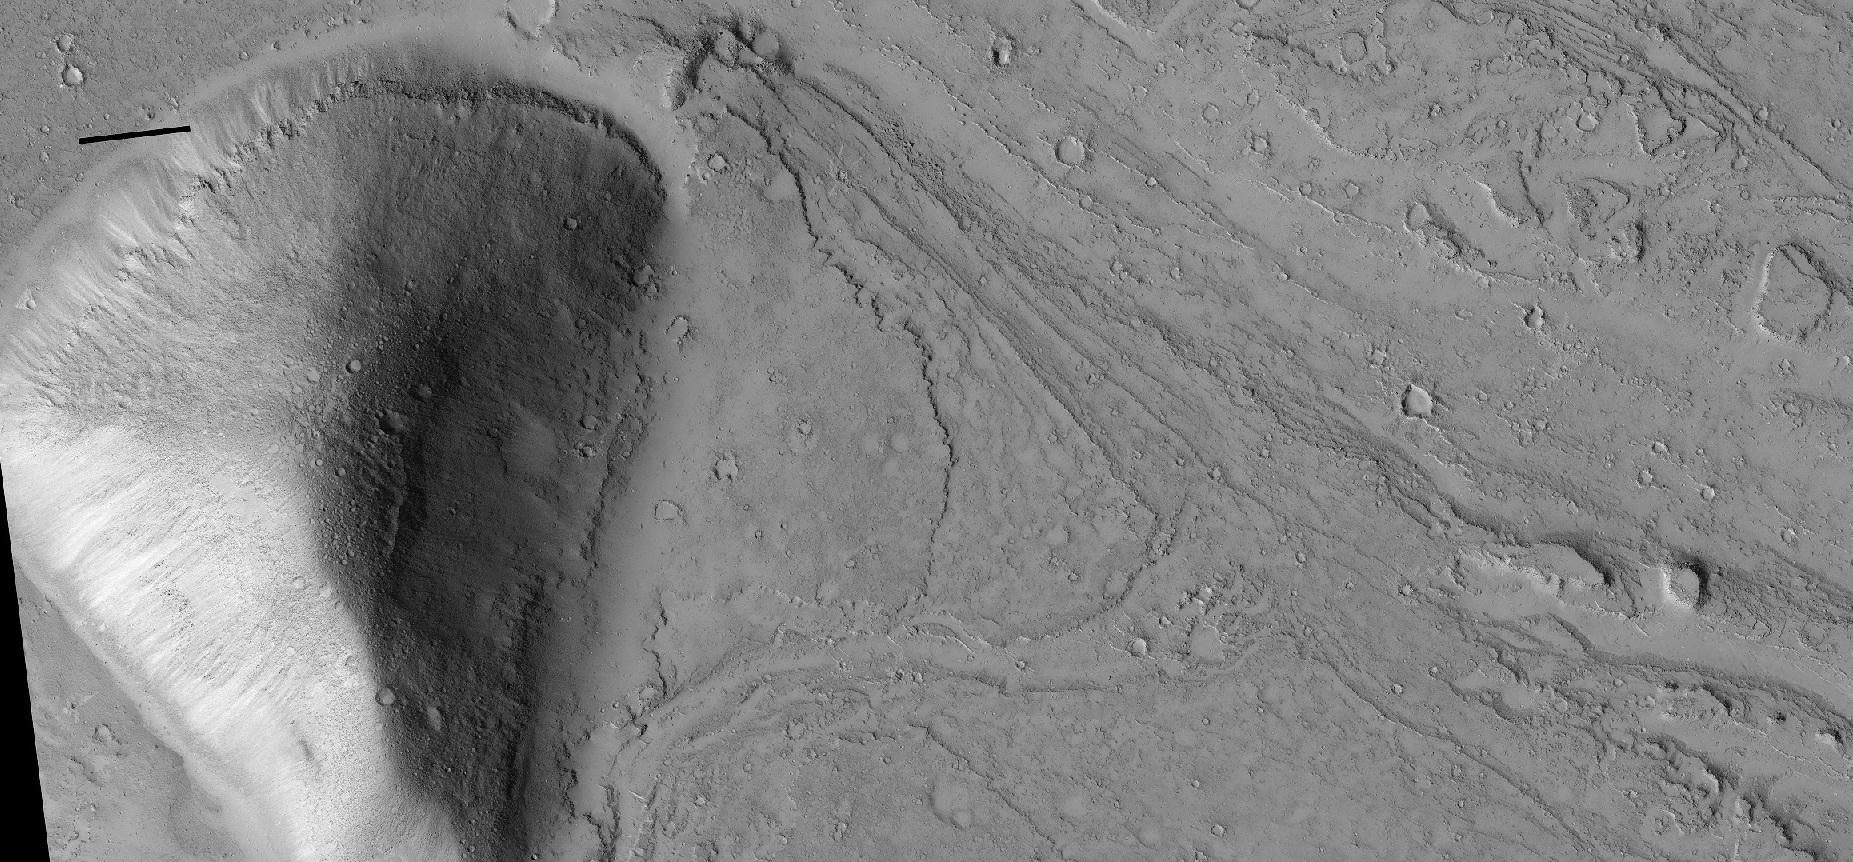 Layers around streamlined knob, as seen by HiRISE under HiWish program